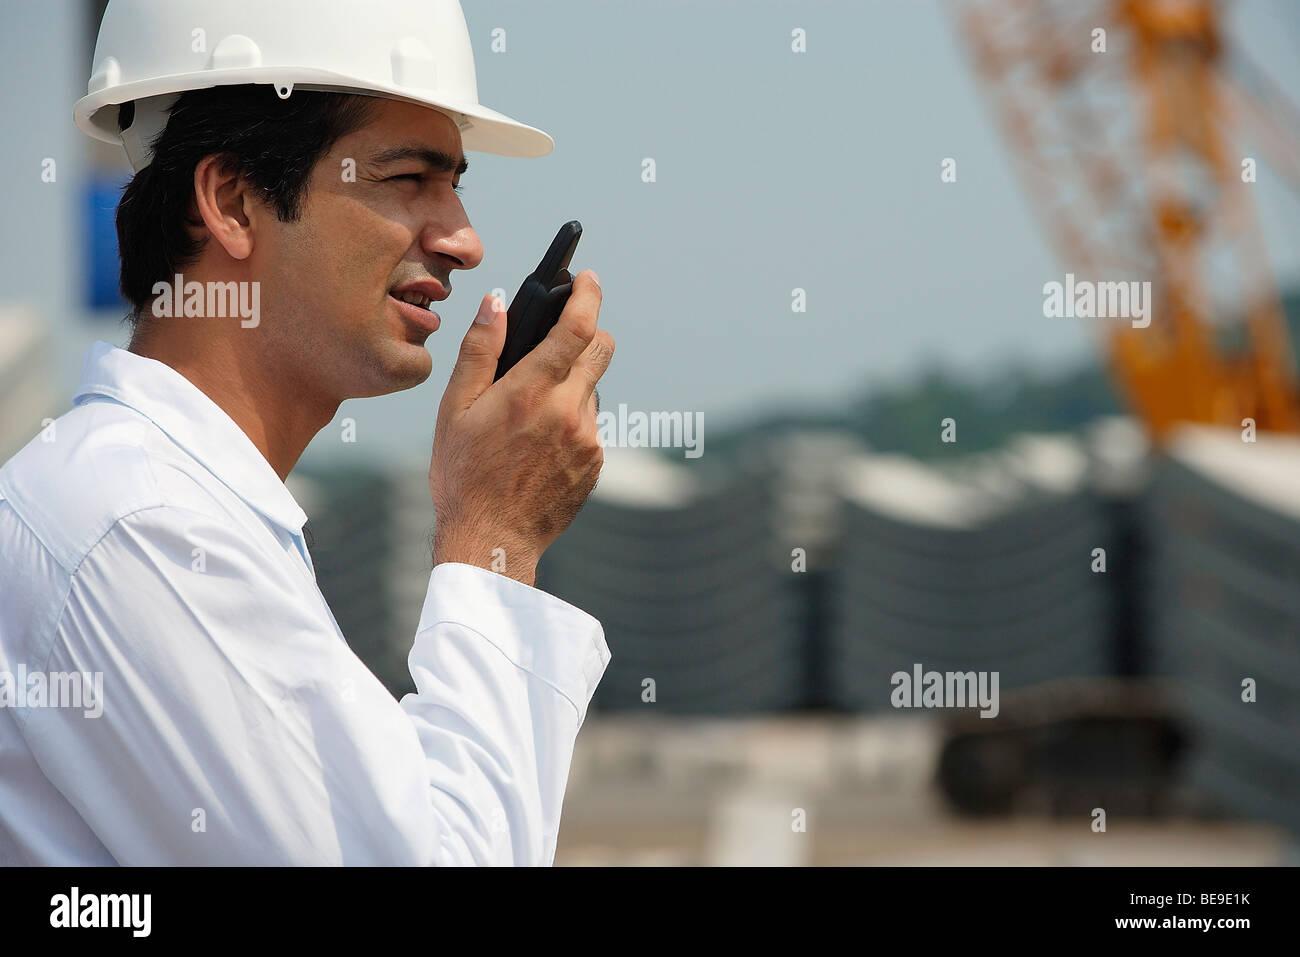 Man in work uniform, talking into walkie talkie - Stock Image